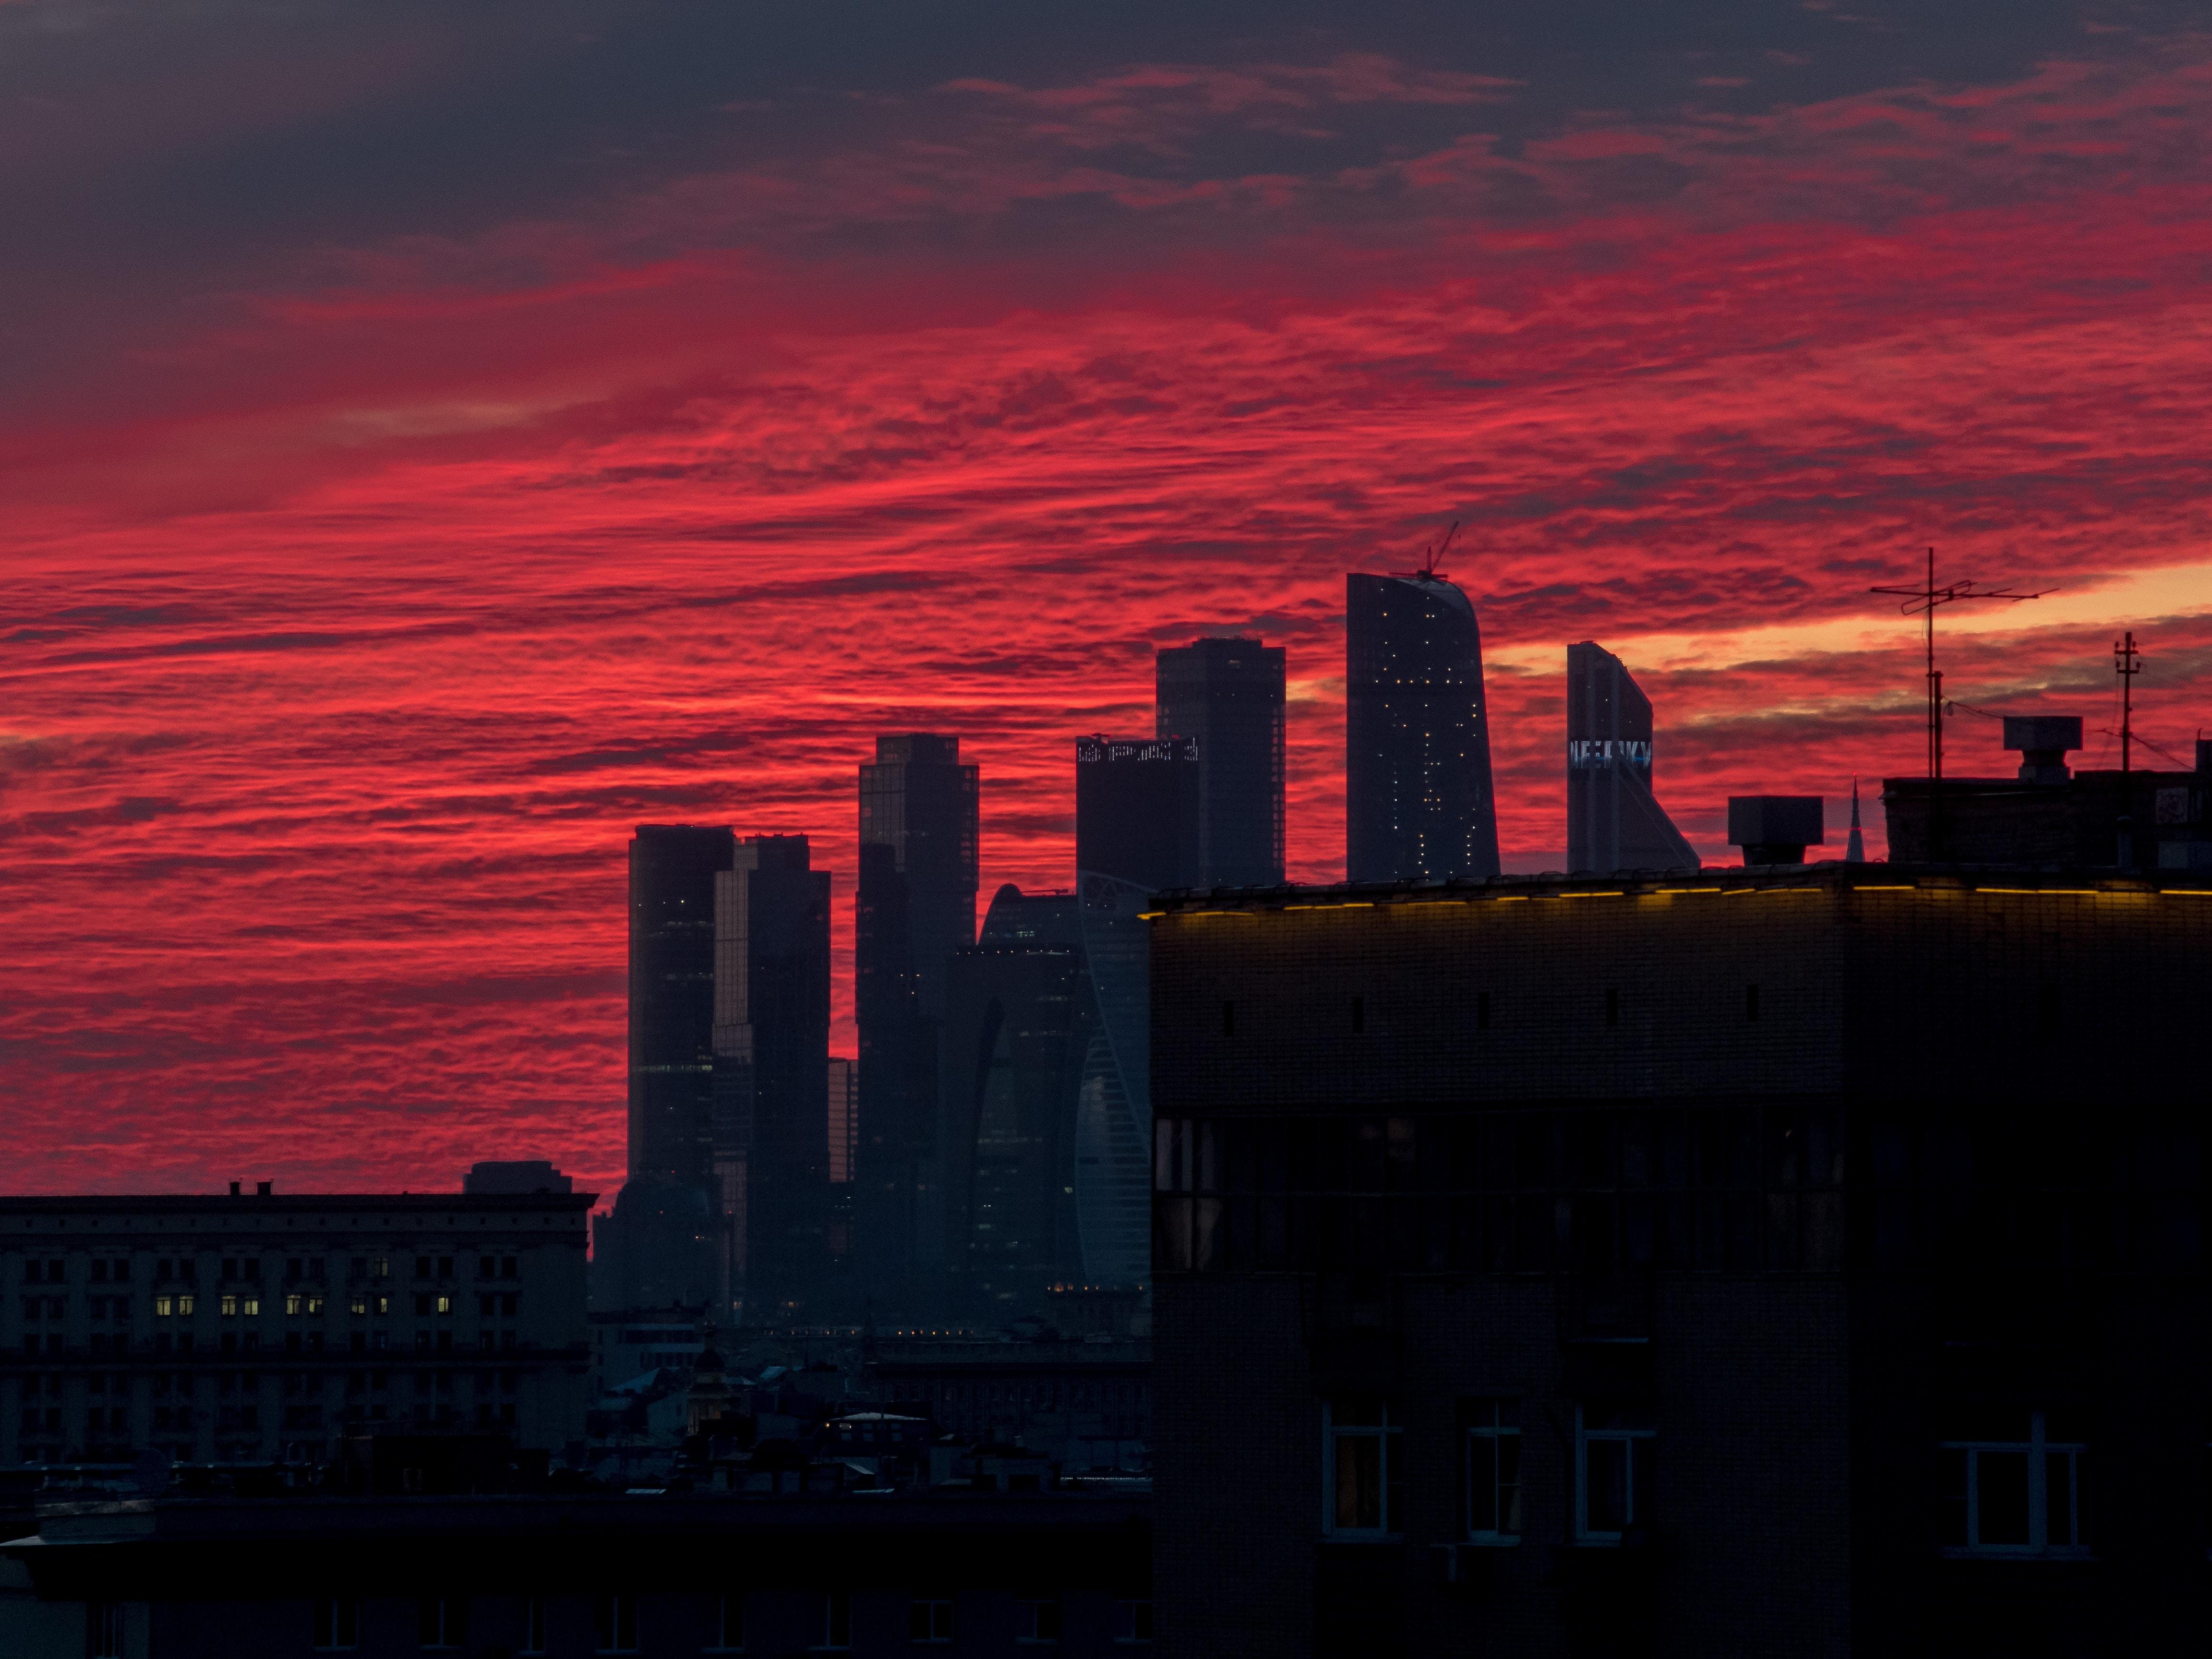 city buildings under sunset